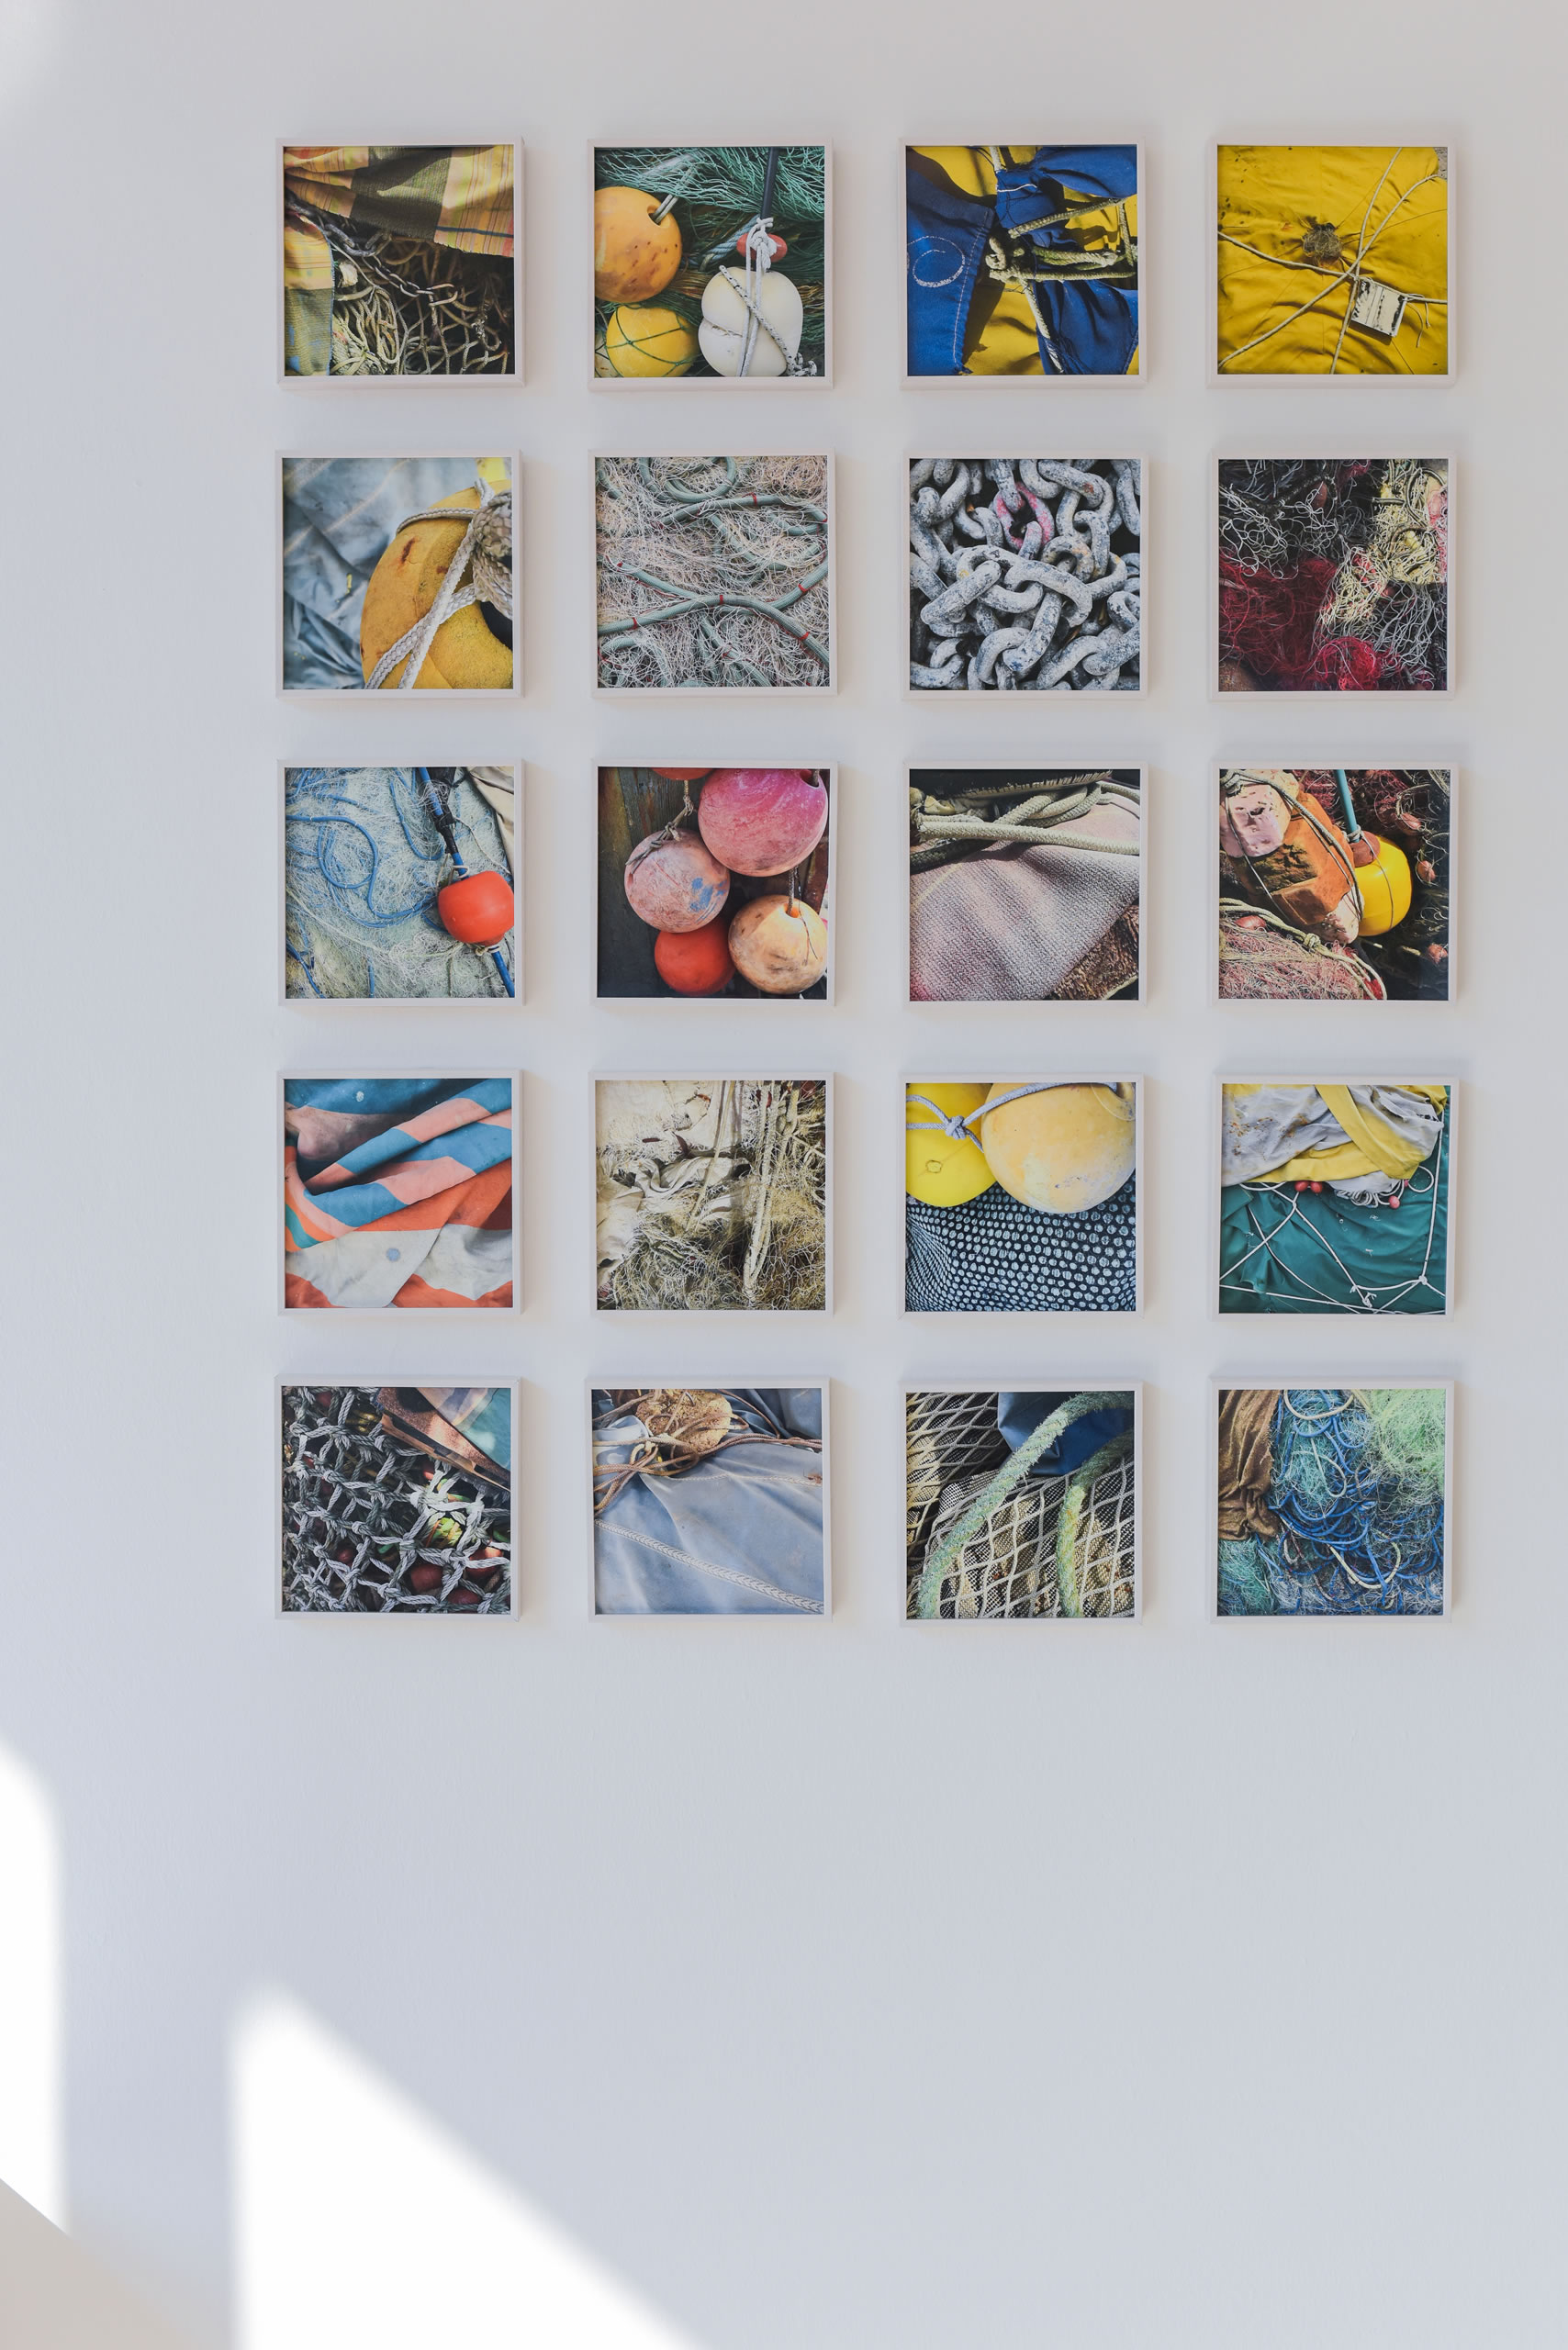 Karen Elliot | vinculo | 2019 | print sobre brytha | Foto Joanna Pinaka | Galerie3